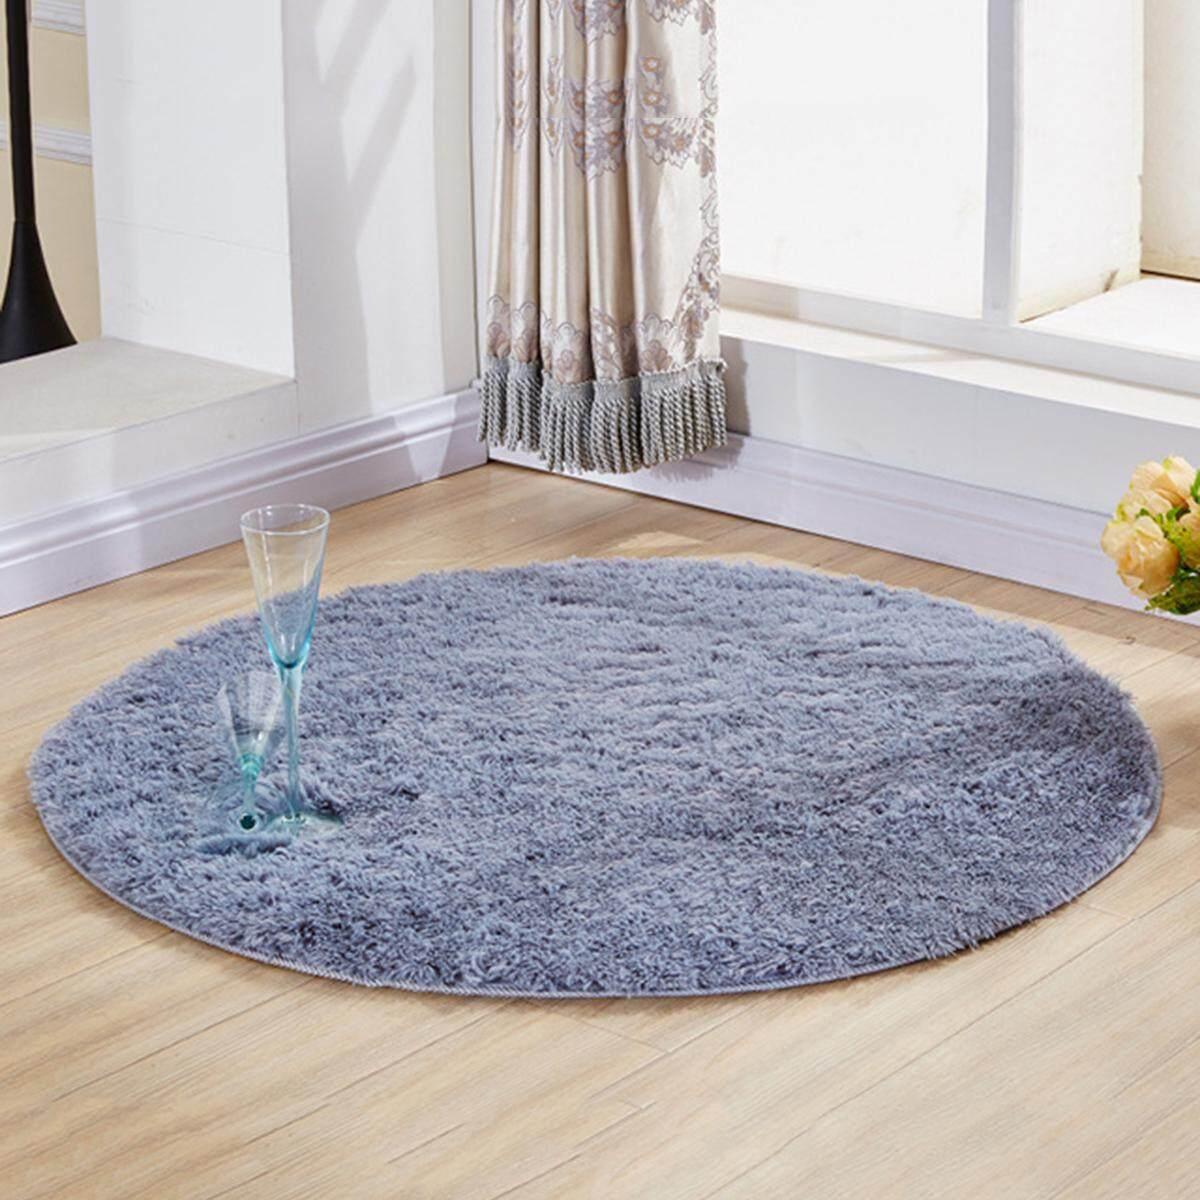 Area Rug Anti Skid Round Shape Fluffy Shag Area Rug Room Carpet for Living Room Bedroom 120cm - intl